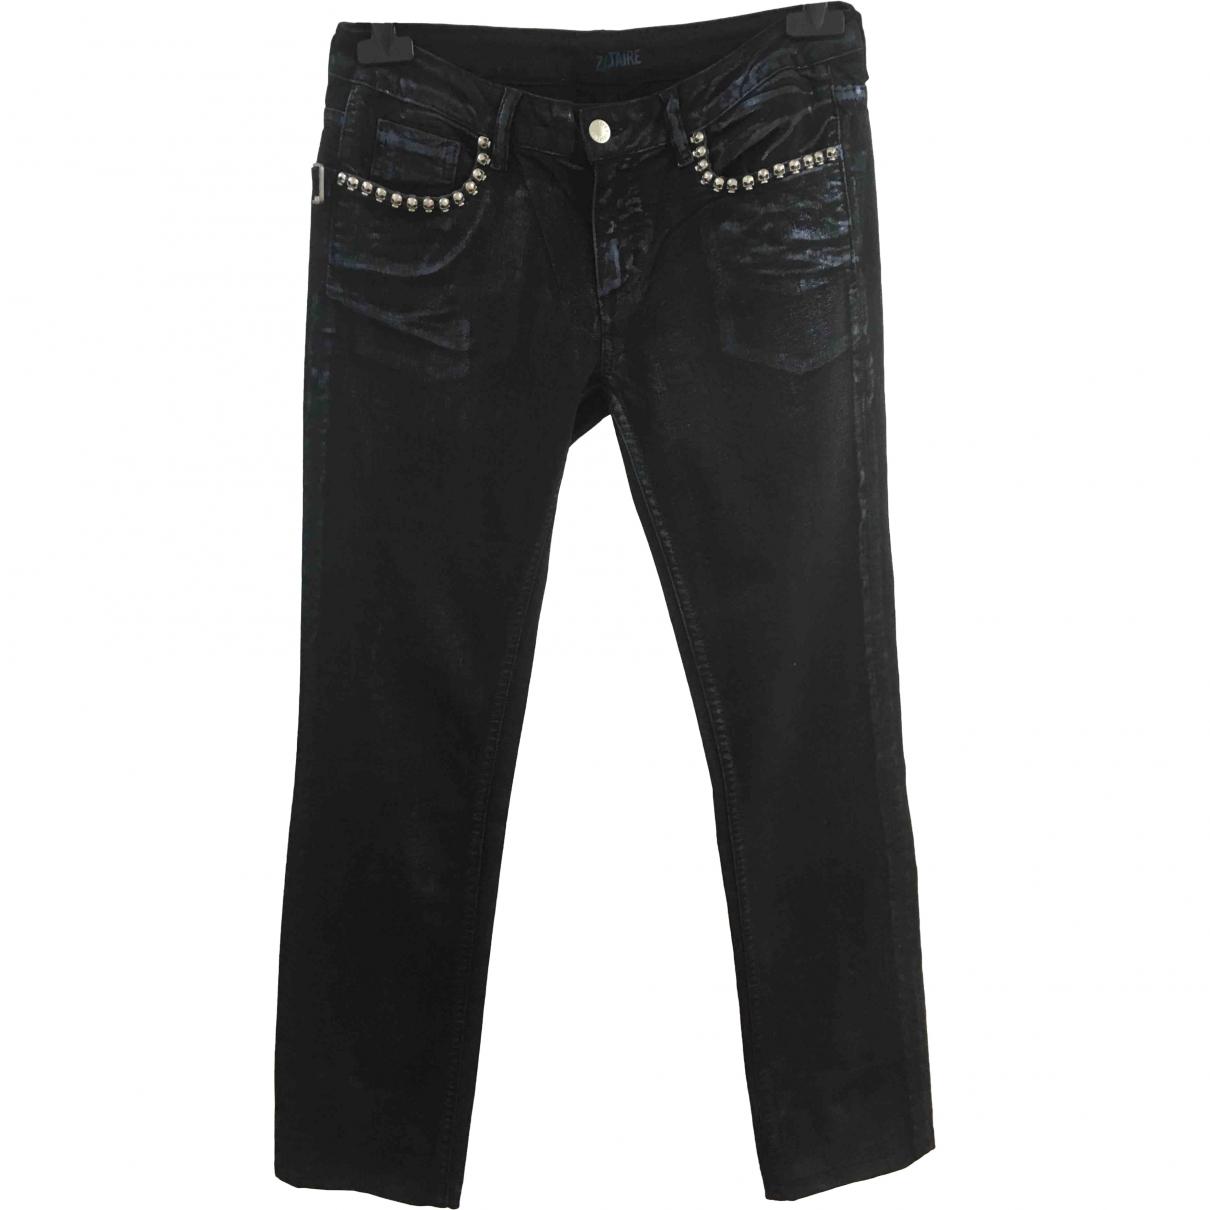 Zadig & Voltaire \N Black Cotton Jeans for Women 27 US